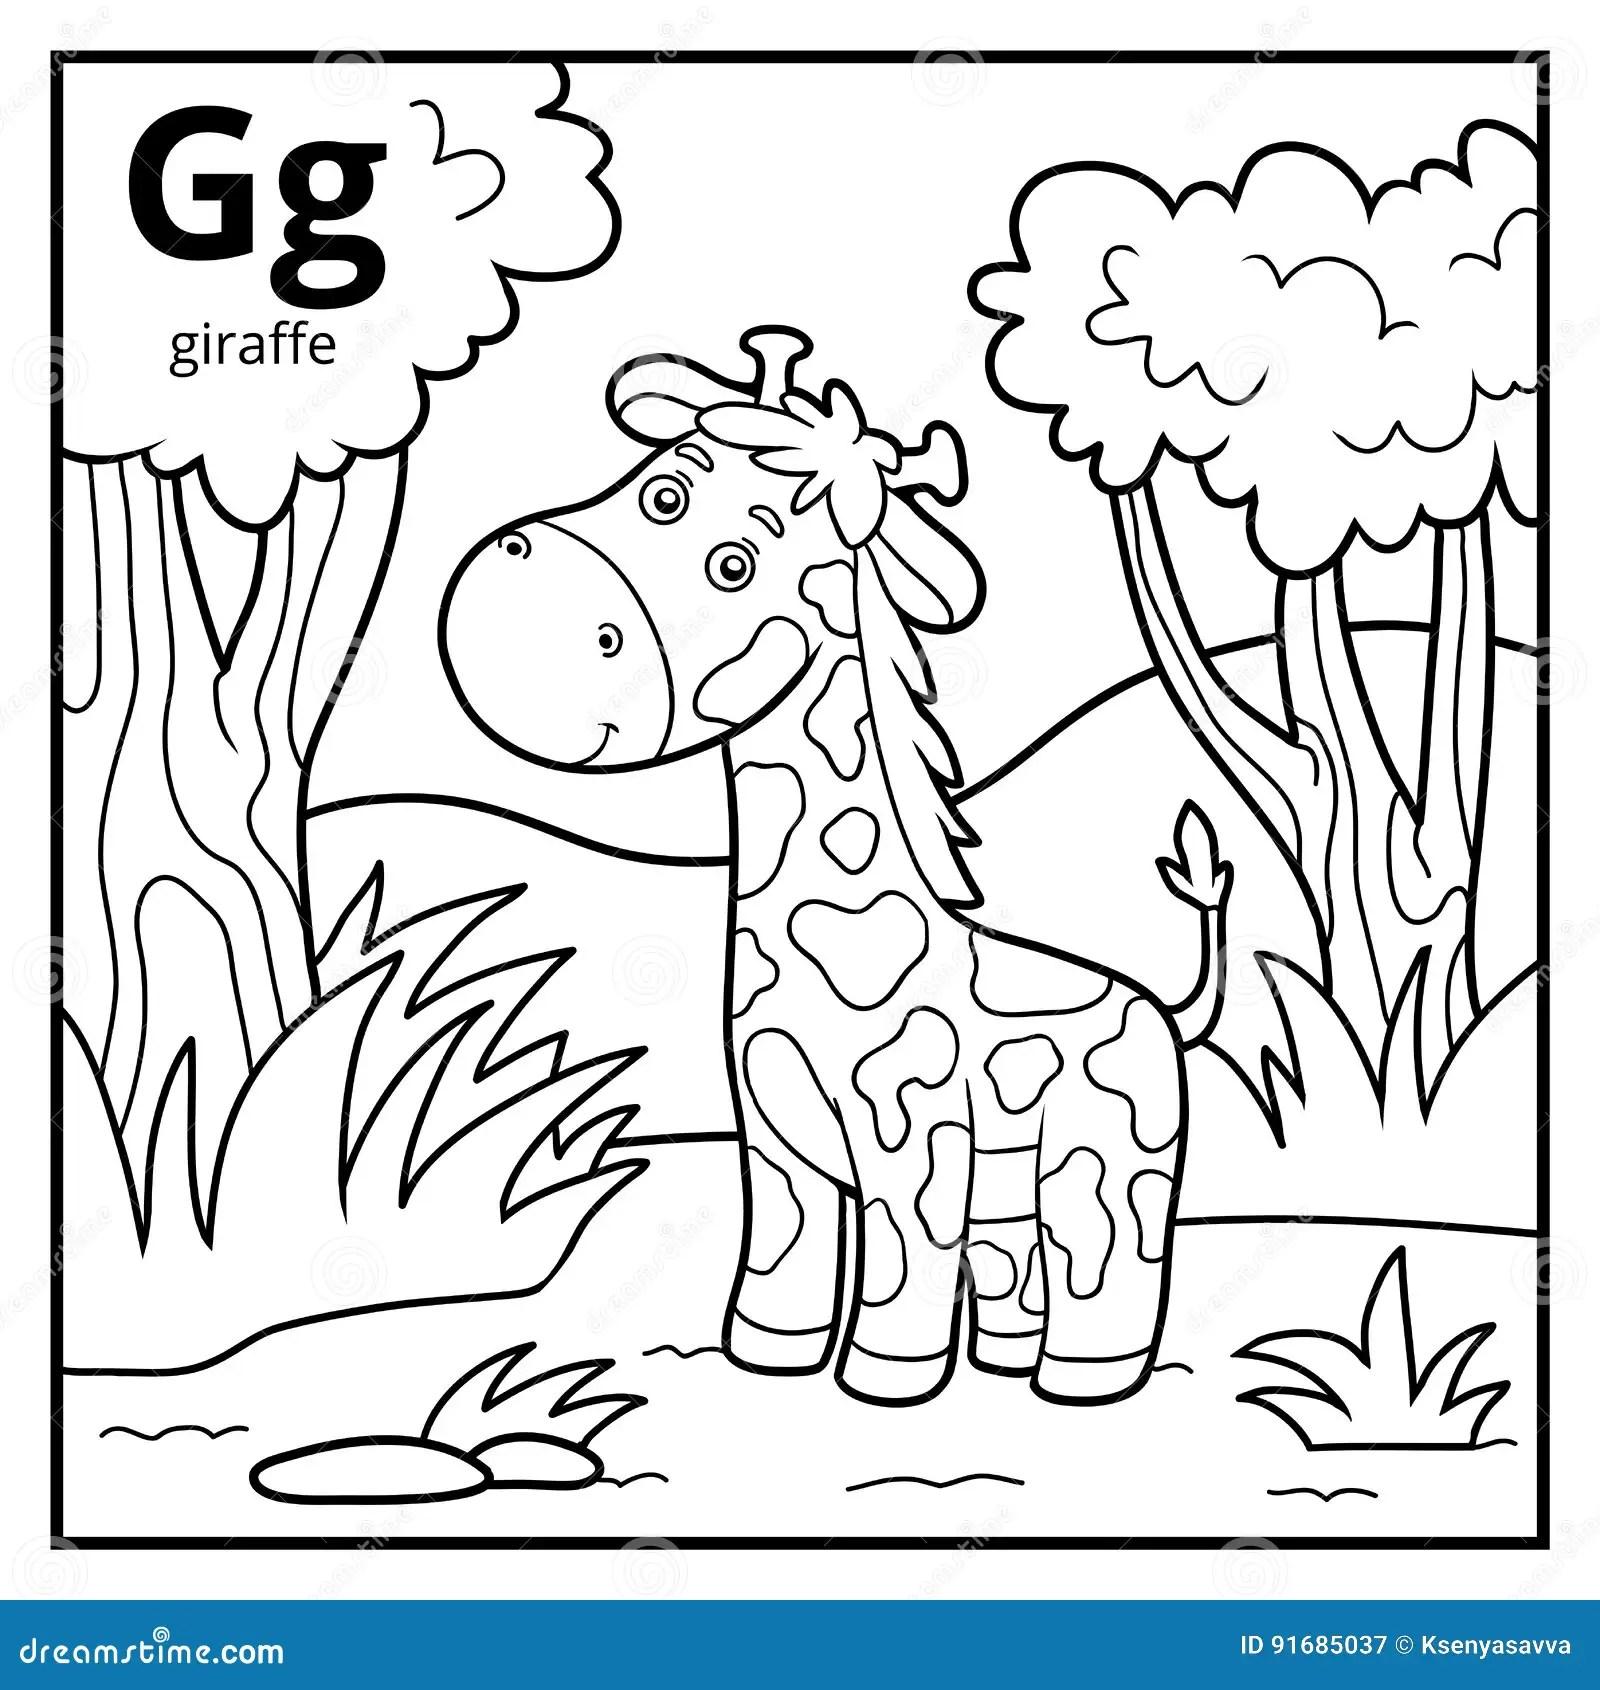 Coloring Book Colorless Alphabet Letter G Giraffe Stock